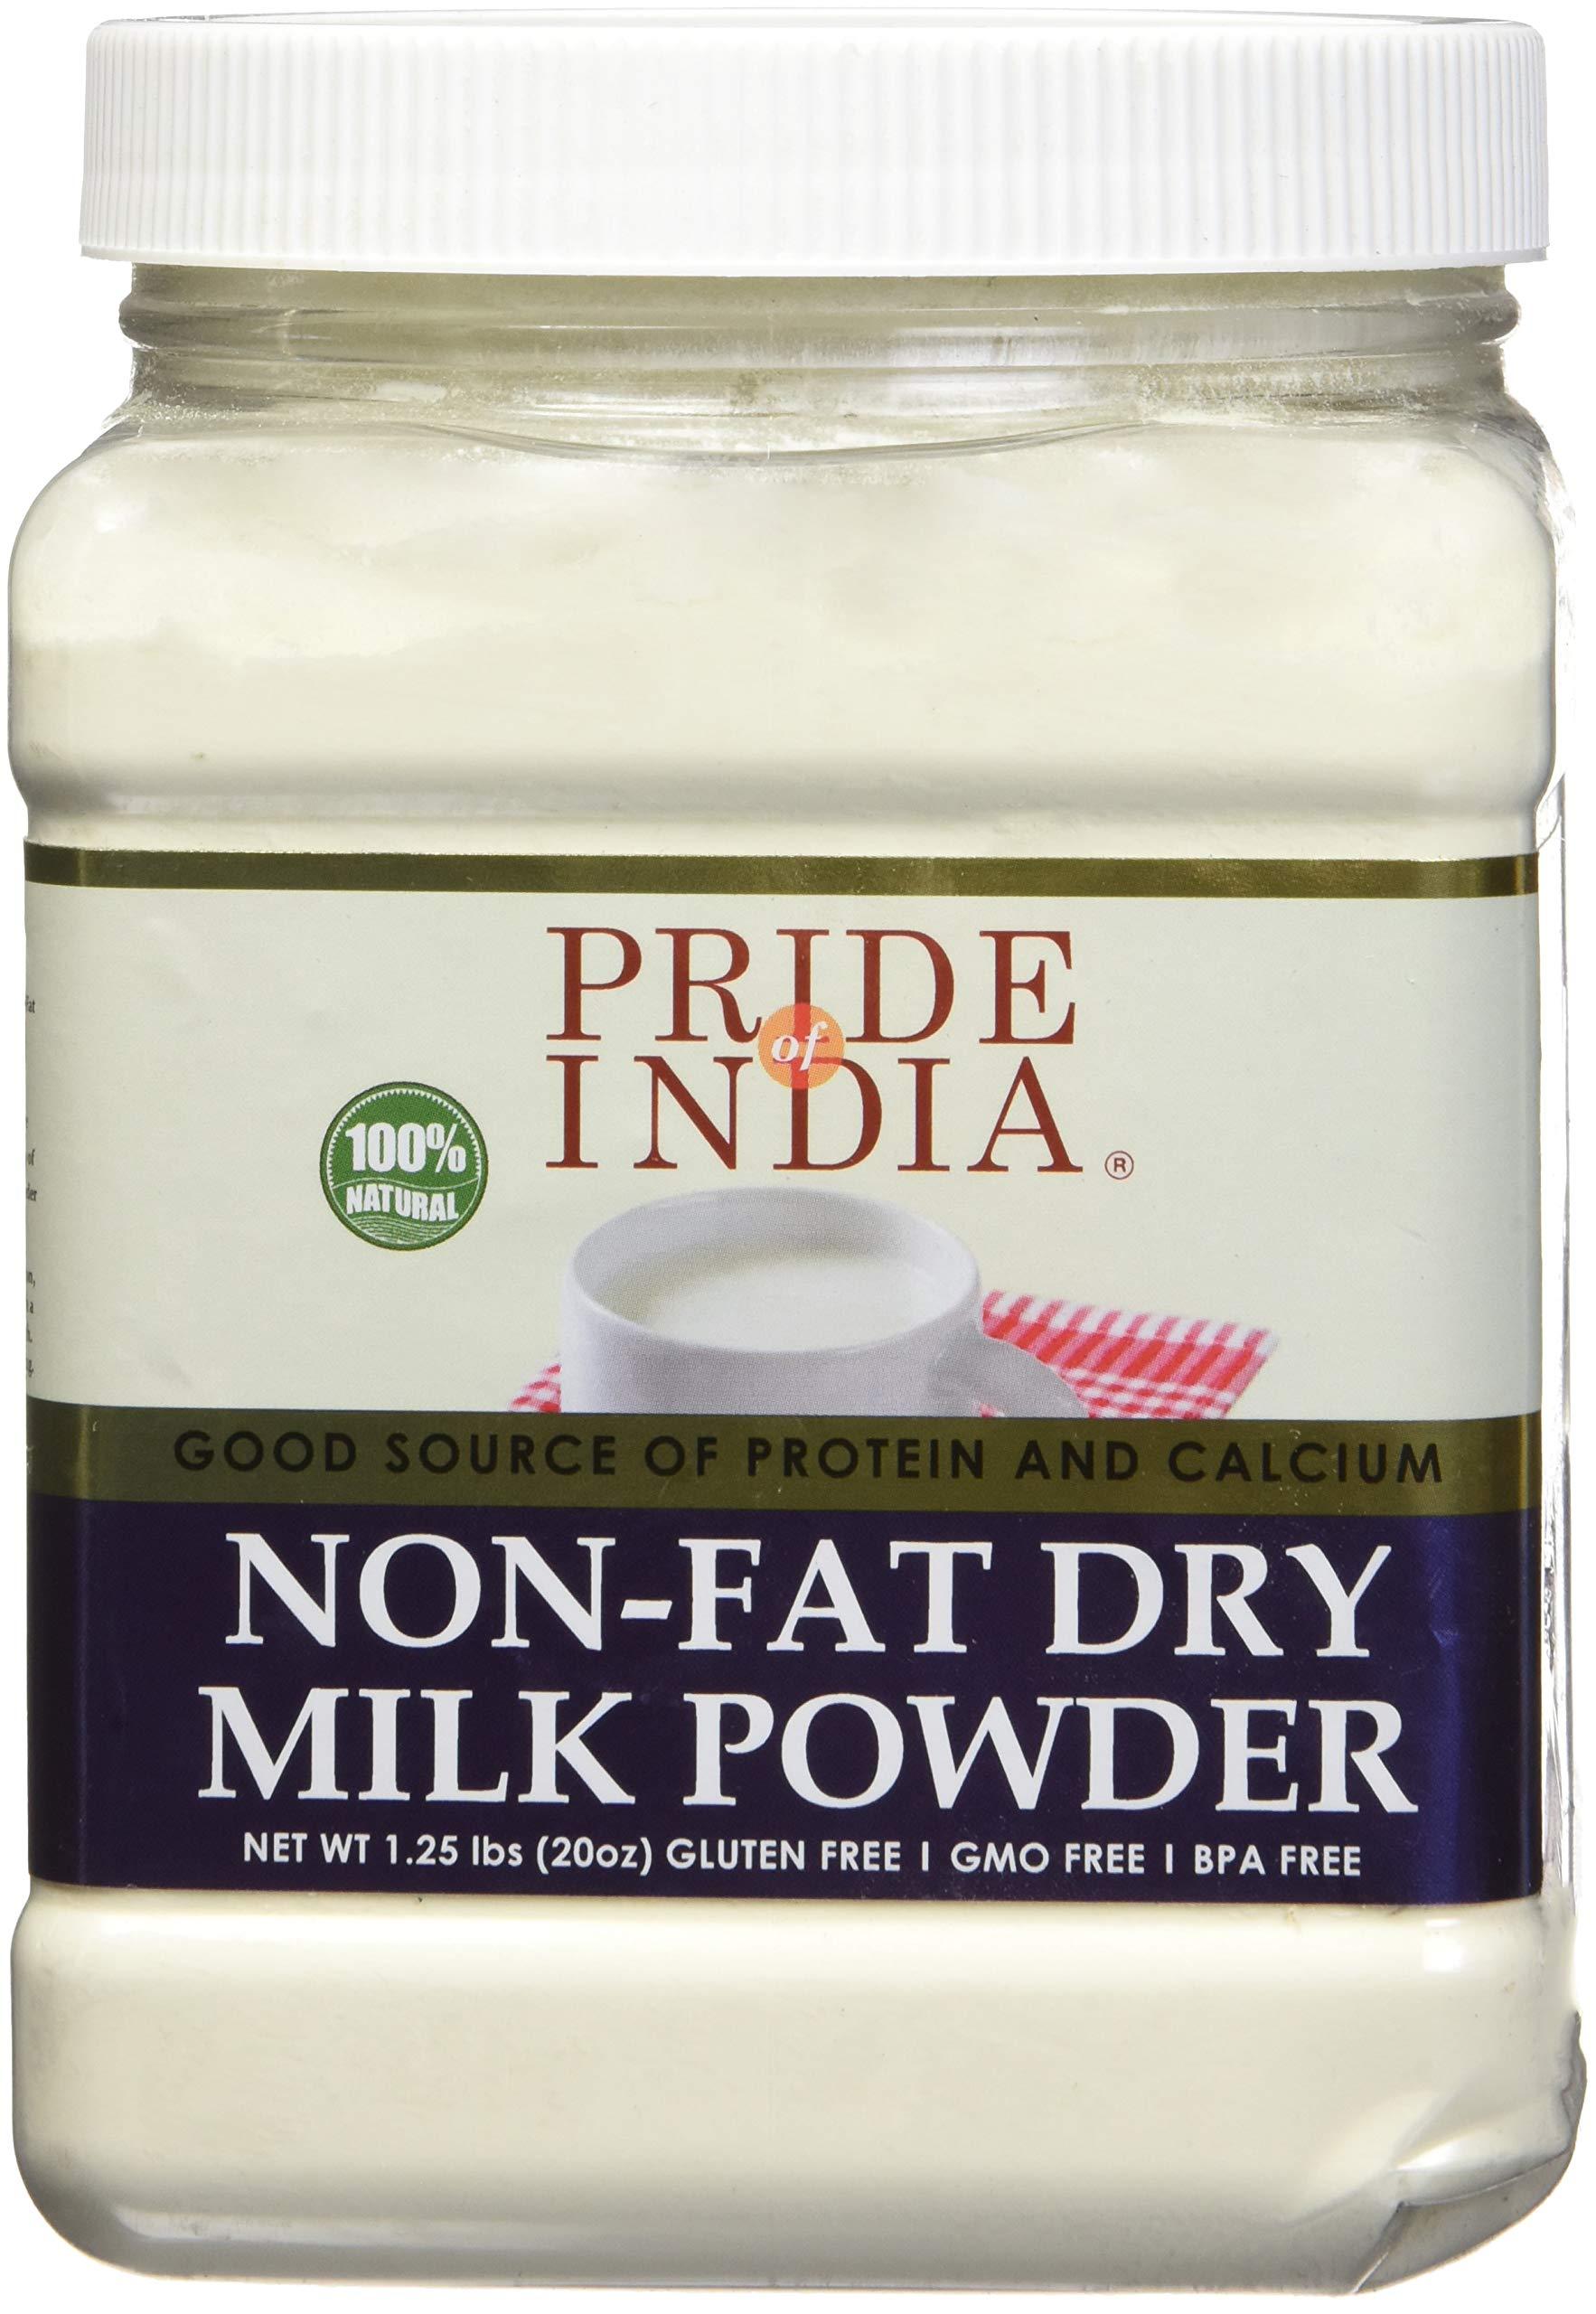 Pride Of India - Nonfat Dry Milk Powder - Protein & Calcium Rich - 1.25 lbs (20oz) Jar